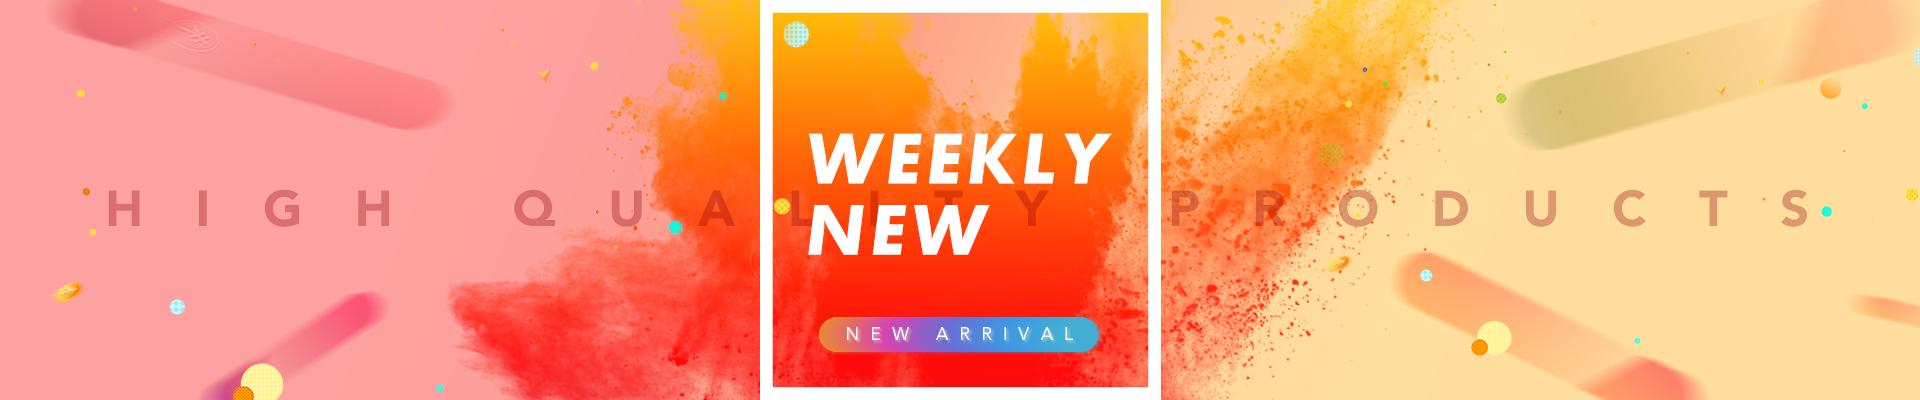 WeeklyNew-1920x400px.png